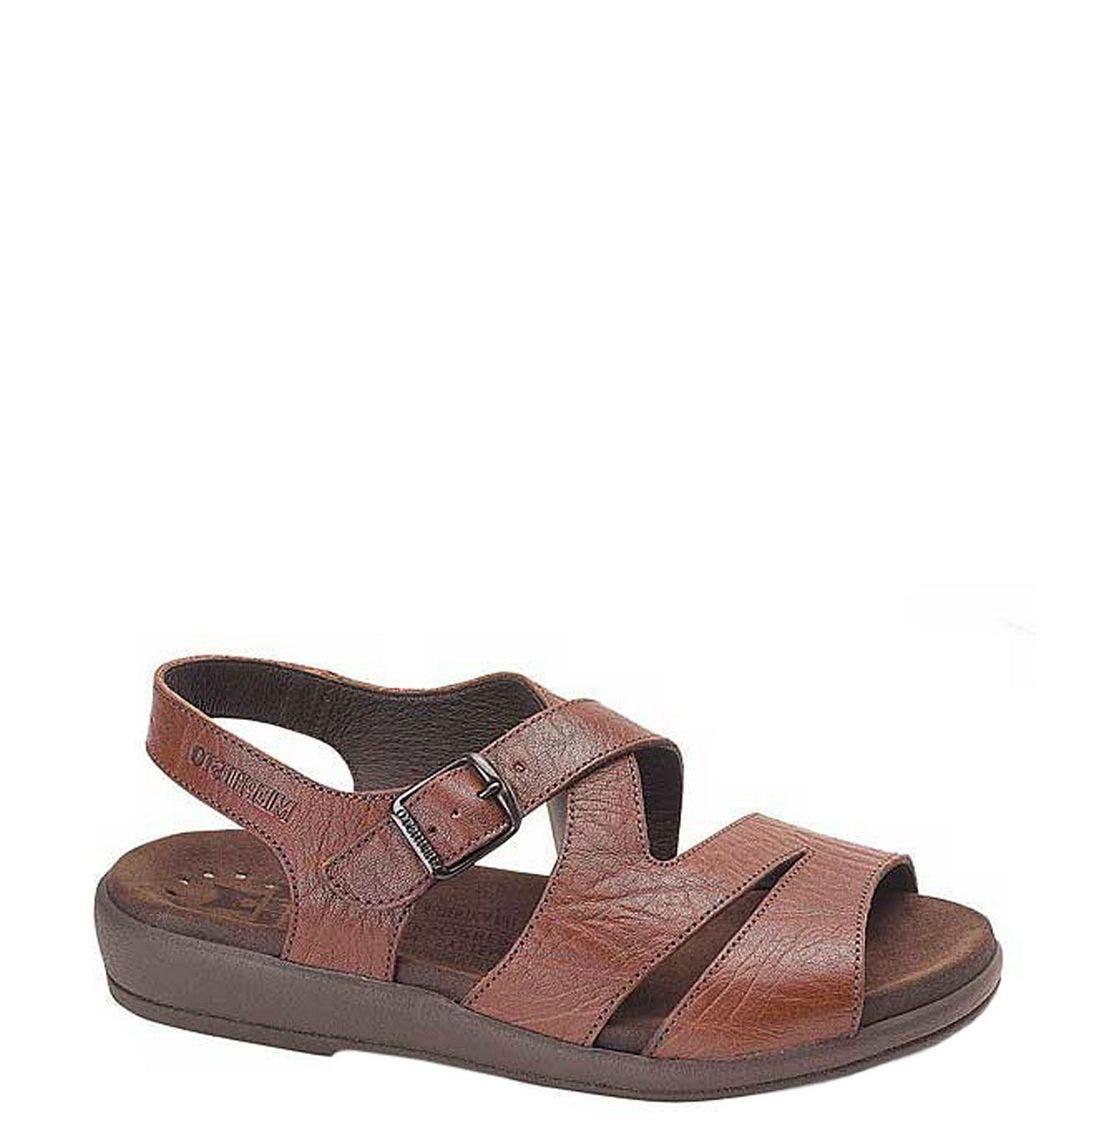 Alternate Image 1 Selected - Mephisto 'Altina' Sandal